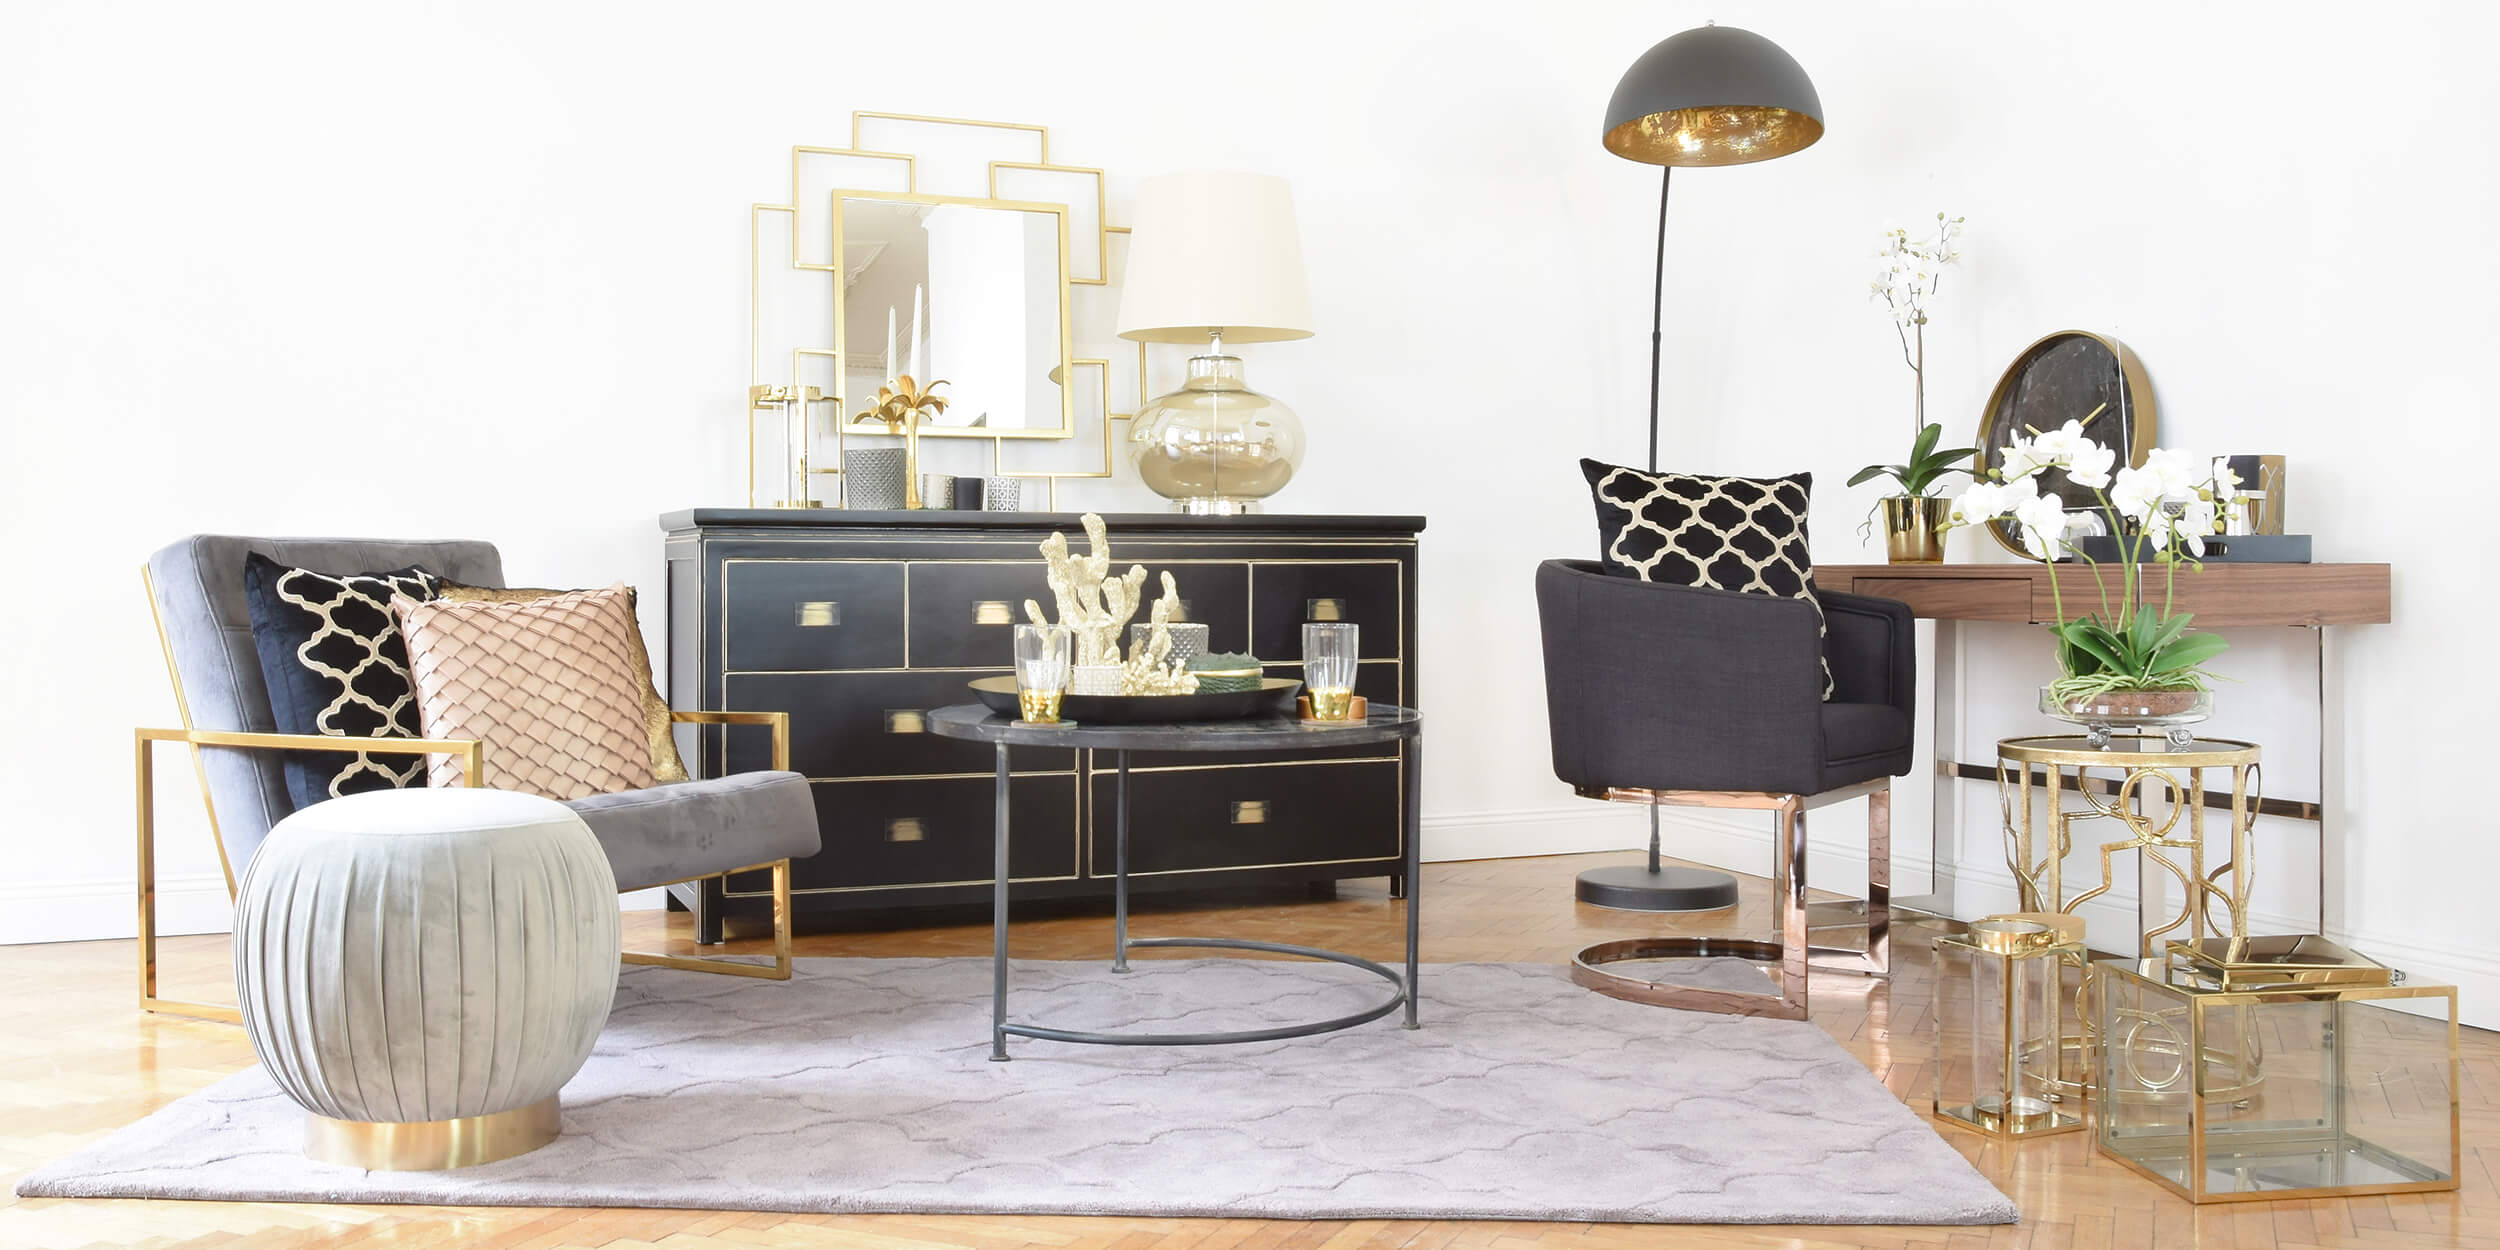 Get the Look: Home Office Elegance - Büro in Gold & Schwarz